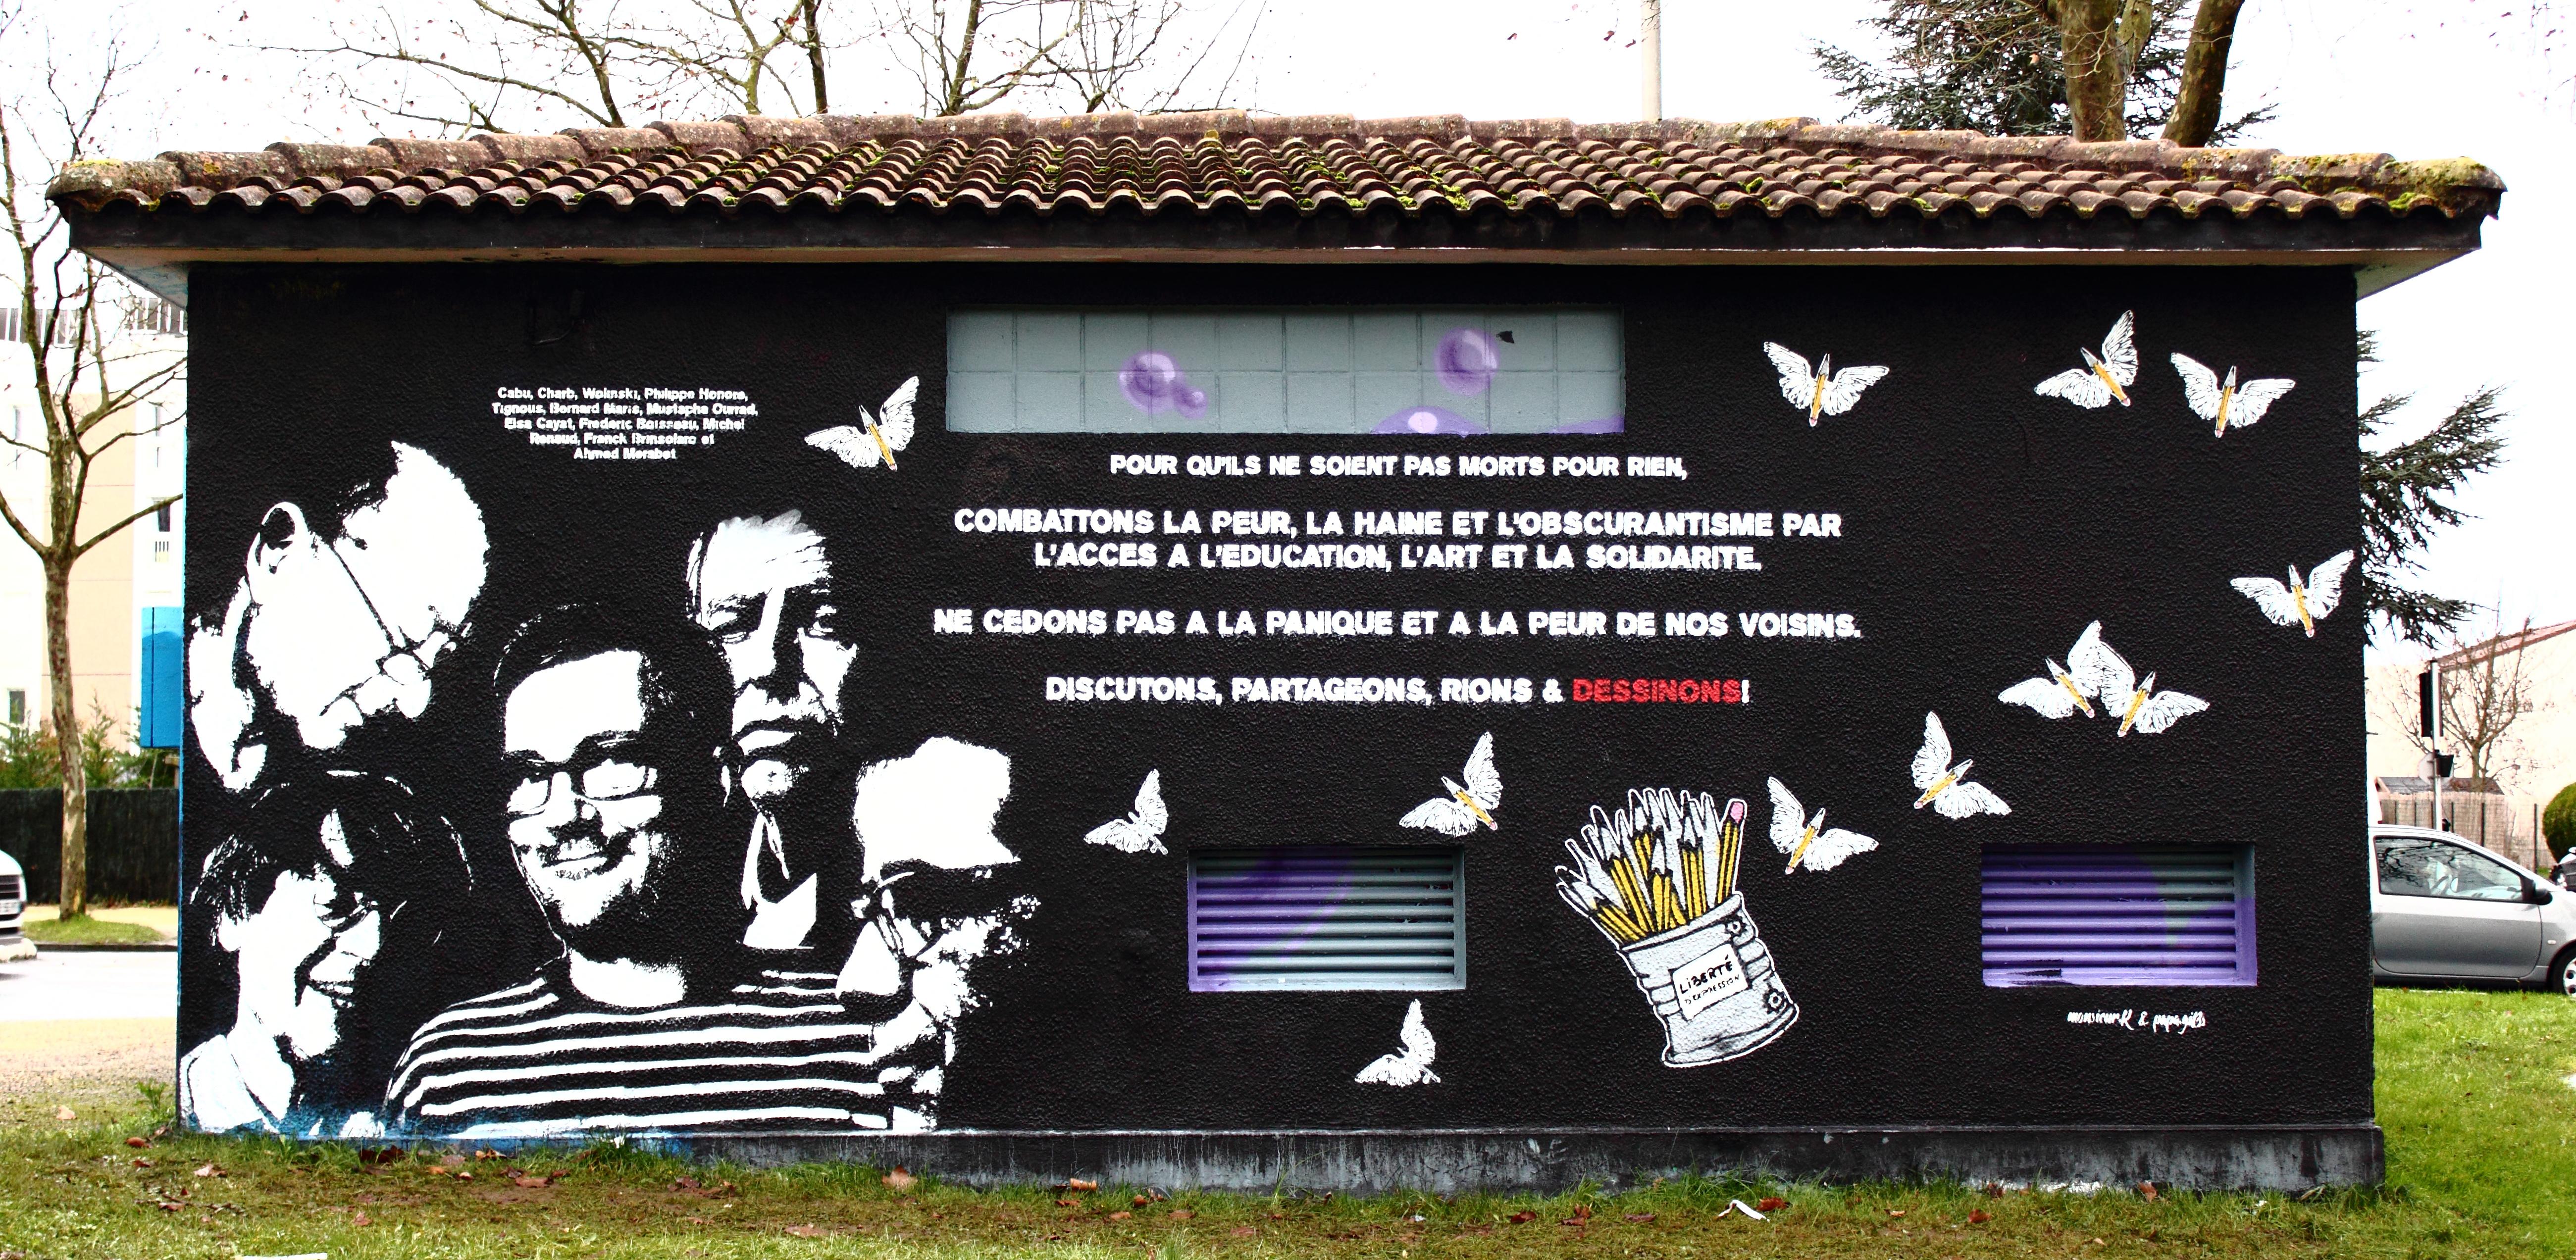 Mural stradalima u napadu na Charlie Hebdo. Izvor: https://www.flickr.com/photos/thx_1139_gallery_flickr/15622346534/in/photolist-pNuBmj-pQkTYU-qFvKLQ-qr7thb-qKsCKB-qraypE-5GhW2k-qrEuUJ-qJ8h8A-qFnUYd-qHDRkU-pM6Sxc-qHAmYD-qrcm6s-qr7tHS-qJhwvA-qM2mXQ-qGEPZq-qJfGbk-qs6b4h-fChQQV-pMtNNV-qvmc5X-pLKxfW-qHWism-qLWi5i-qMhrT4-qt3oG4-pPuQMm-qrdnKf-fCfqBe-pLMeUE-qqWAEq-qrmUha-pLMoPJ-qrkpK4-qFqkpy-qrKCgt-qHBLmi-qrki2e-qre7Do-qKDTHh-qrc5St-pQLGSW-qyv6zW-qHH6wy-qrYRwv-qHD9vh-qJ96pj-qHBC1G